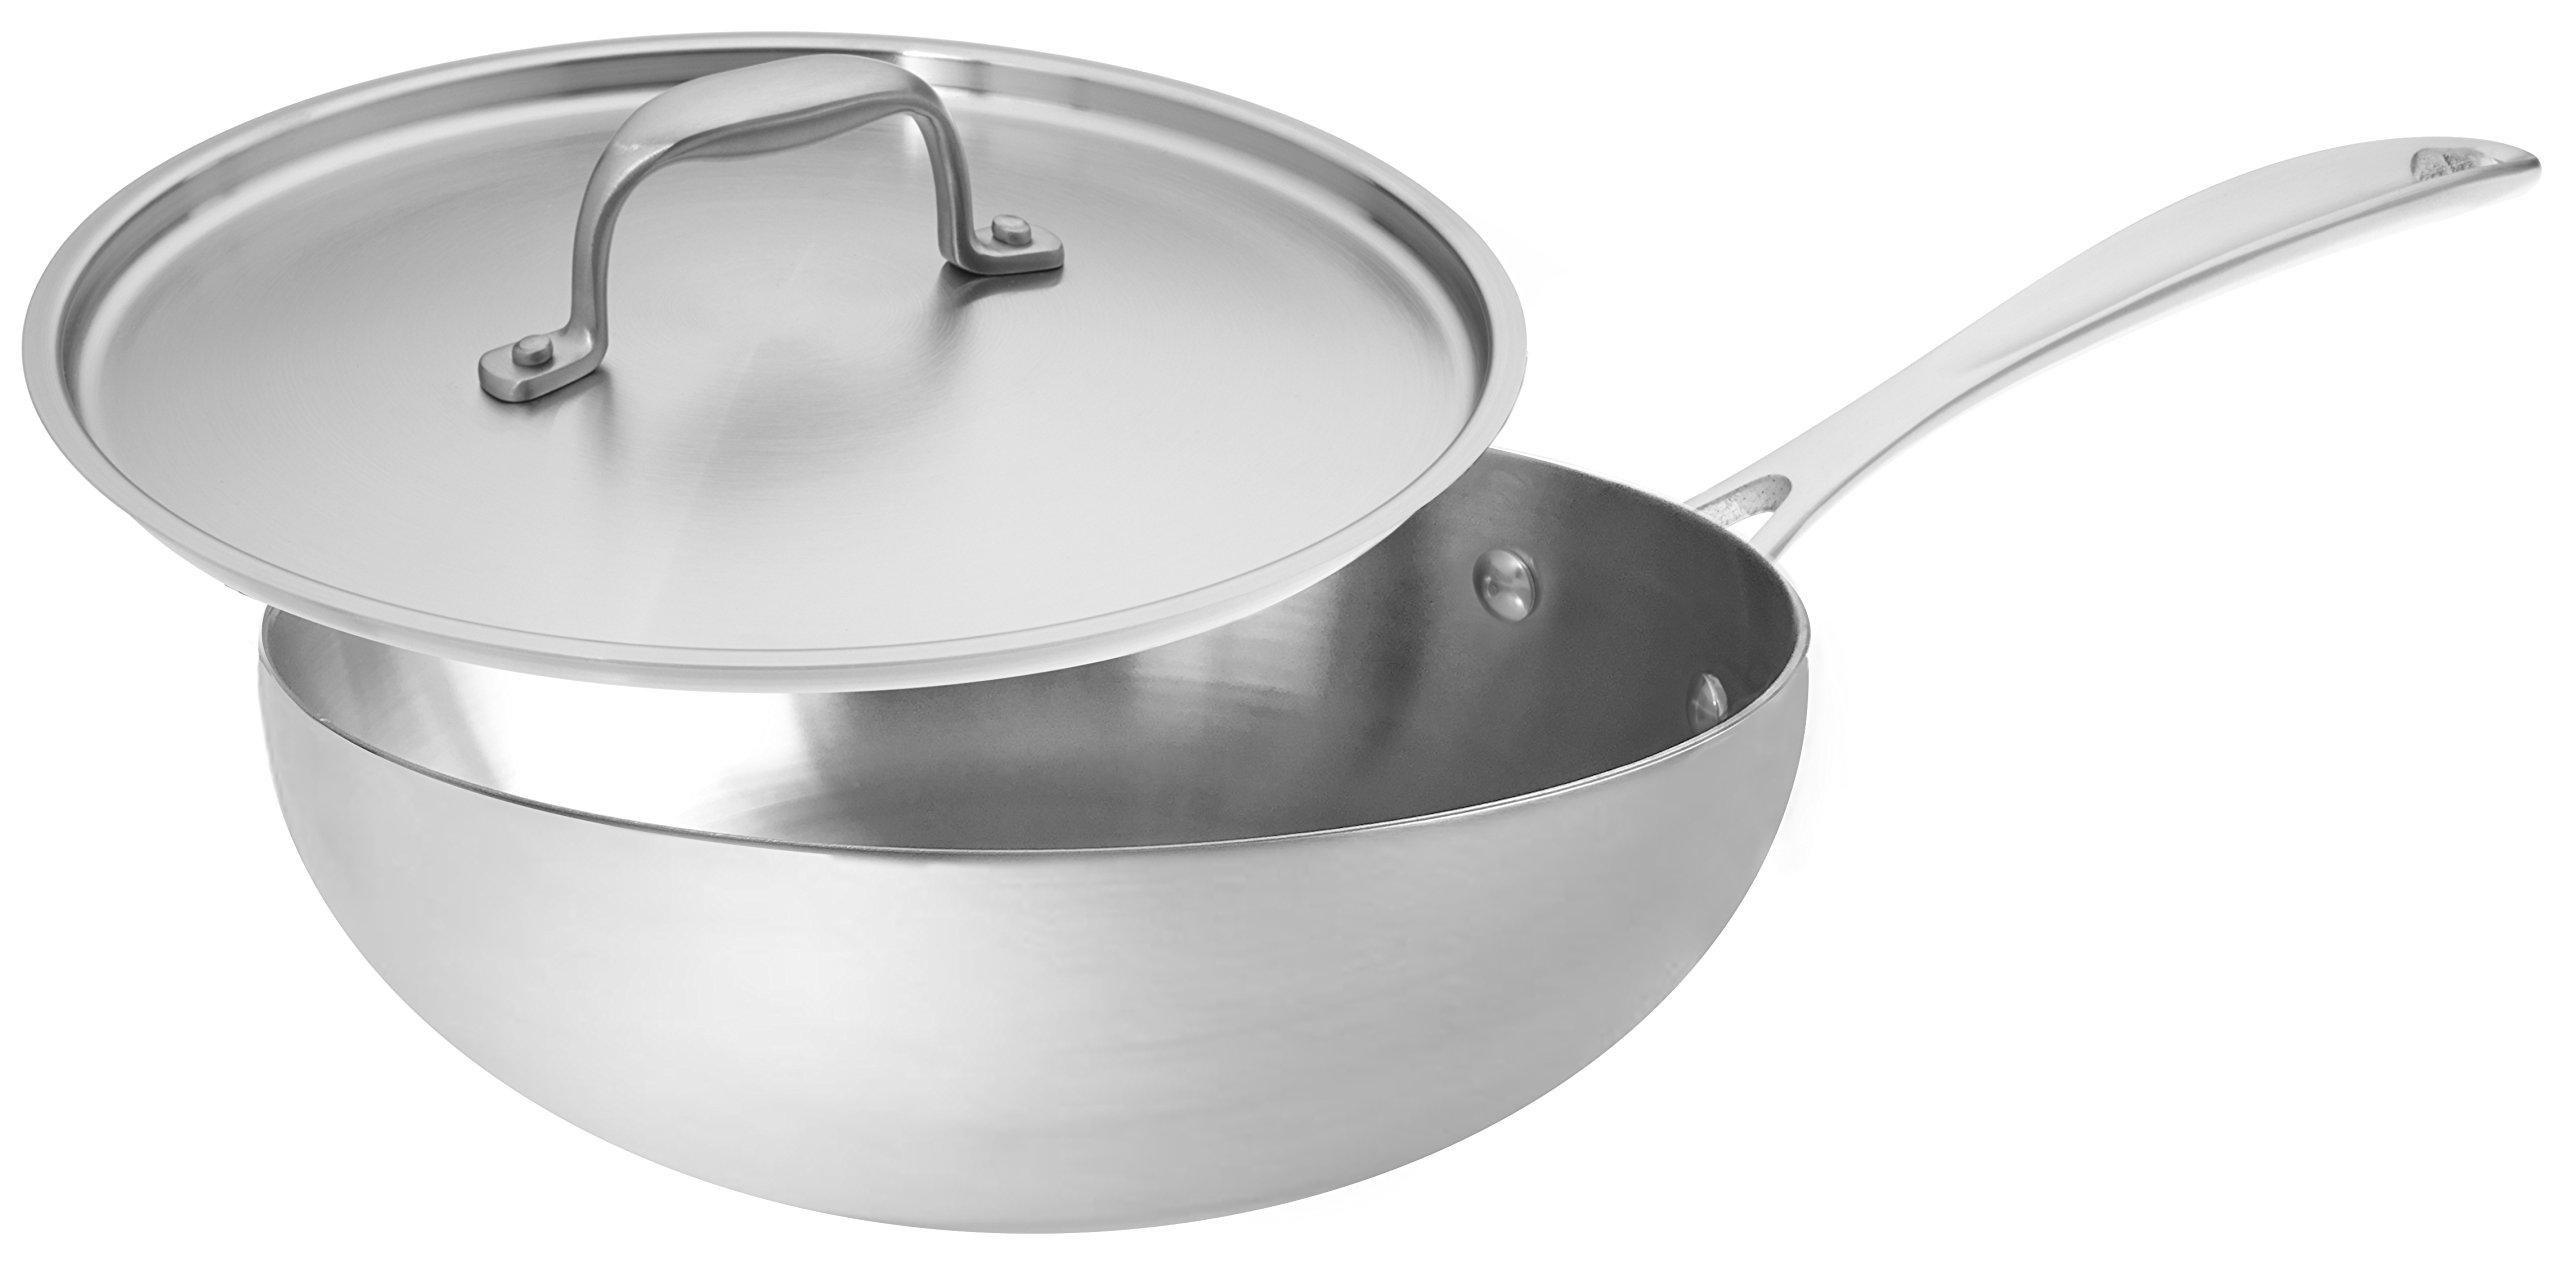 American Kitchen Cookware Premium Stainless Steel Saucier, 3 Quarts